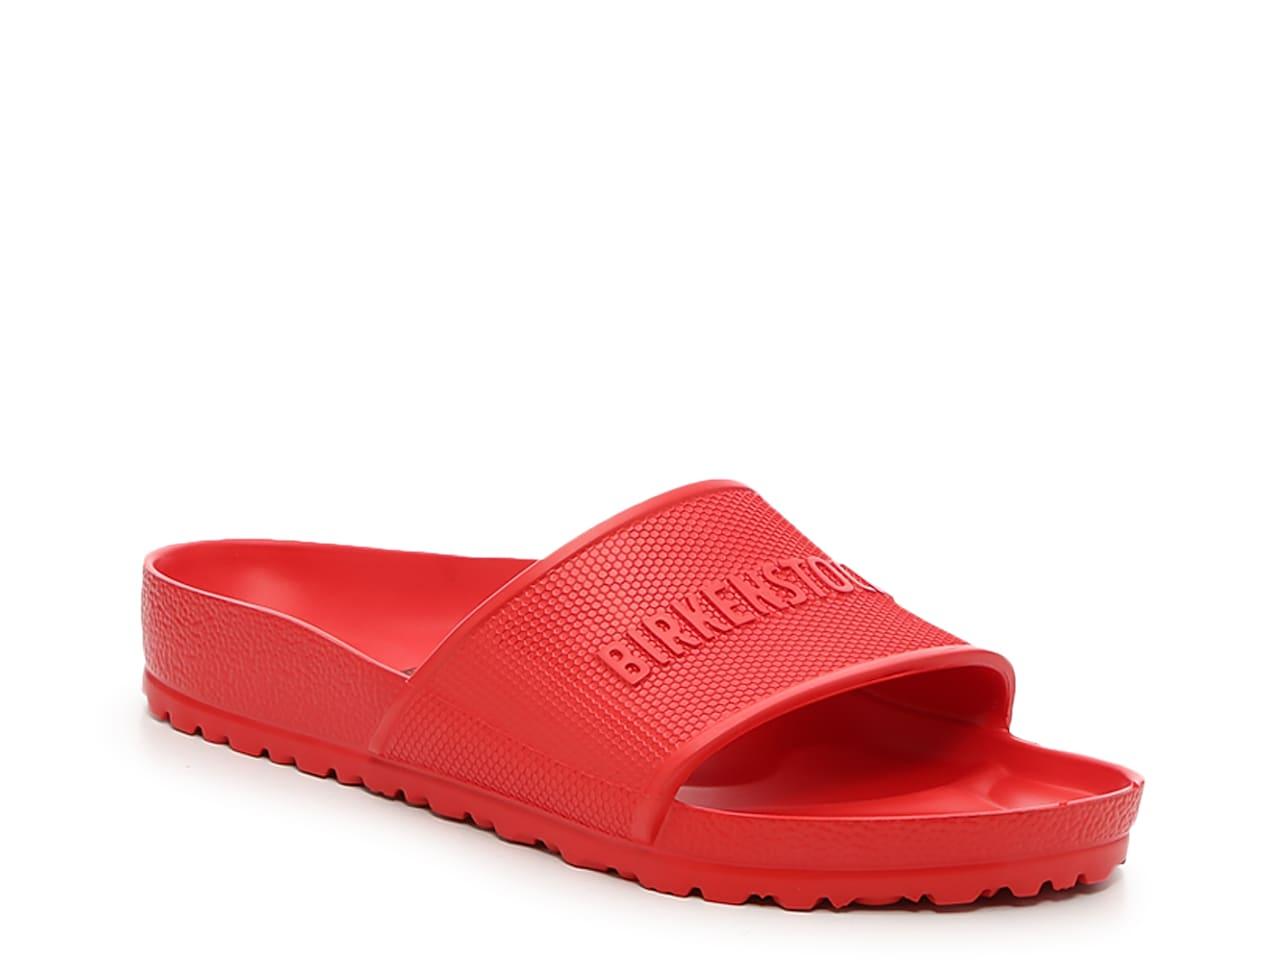 Birkenstock Barbados Slide Sandal - Men's